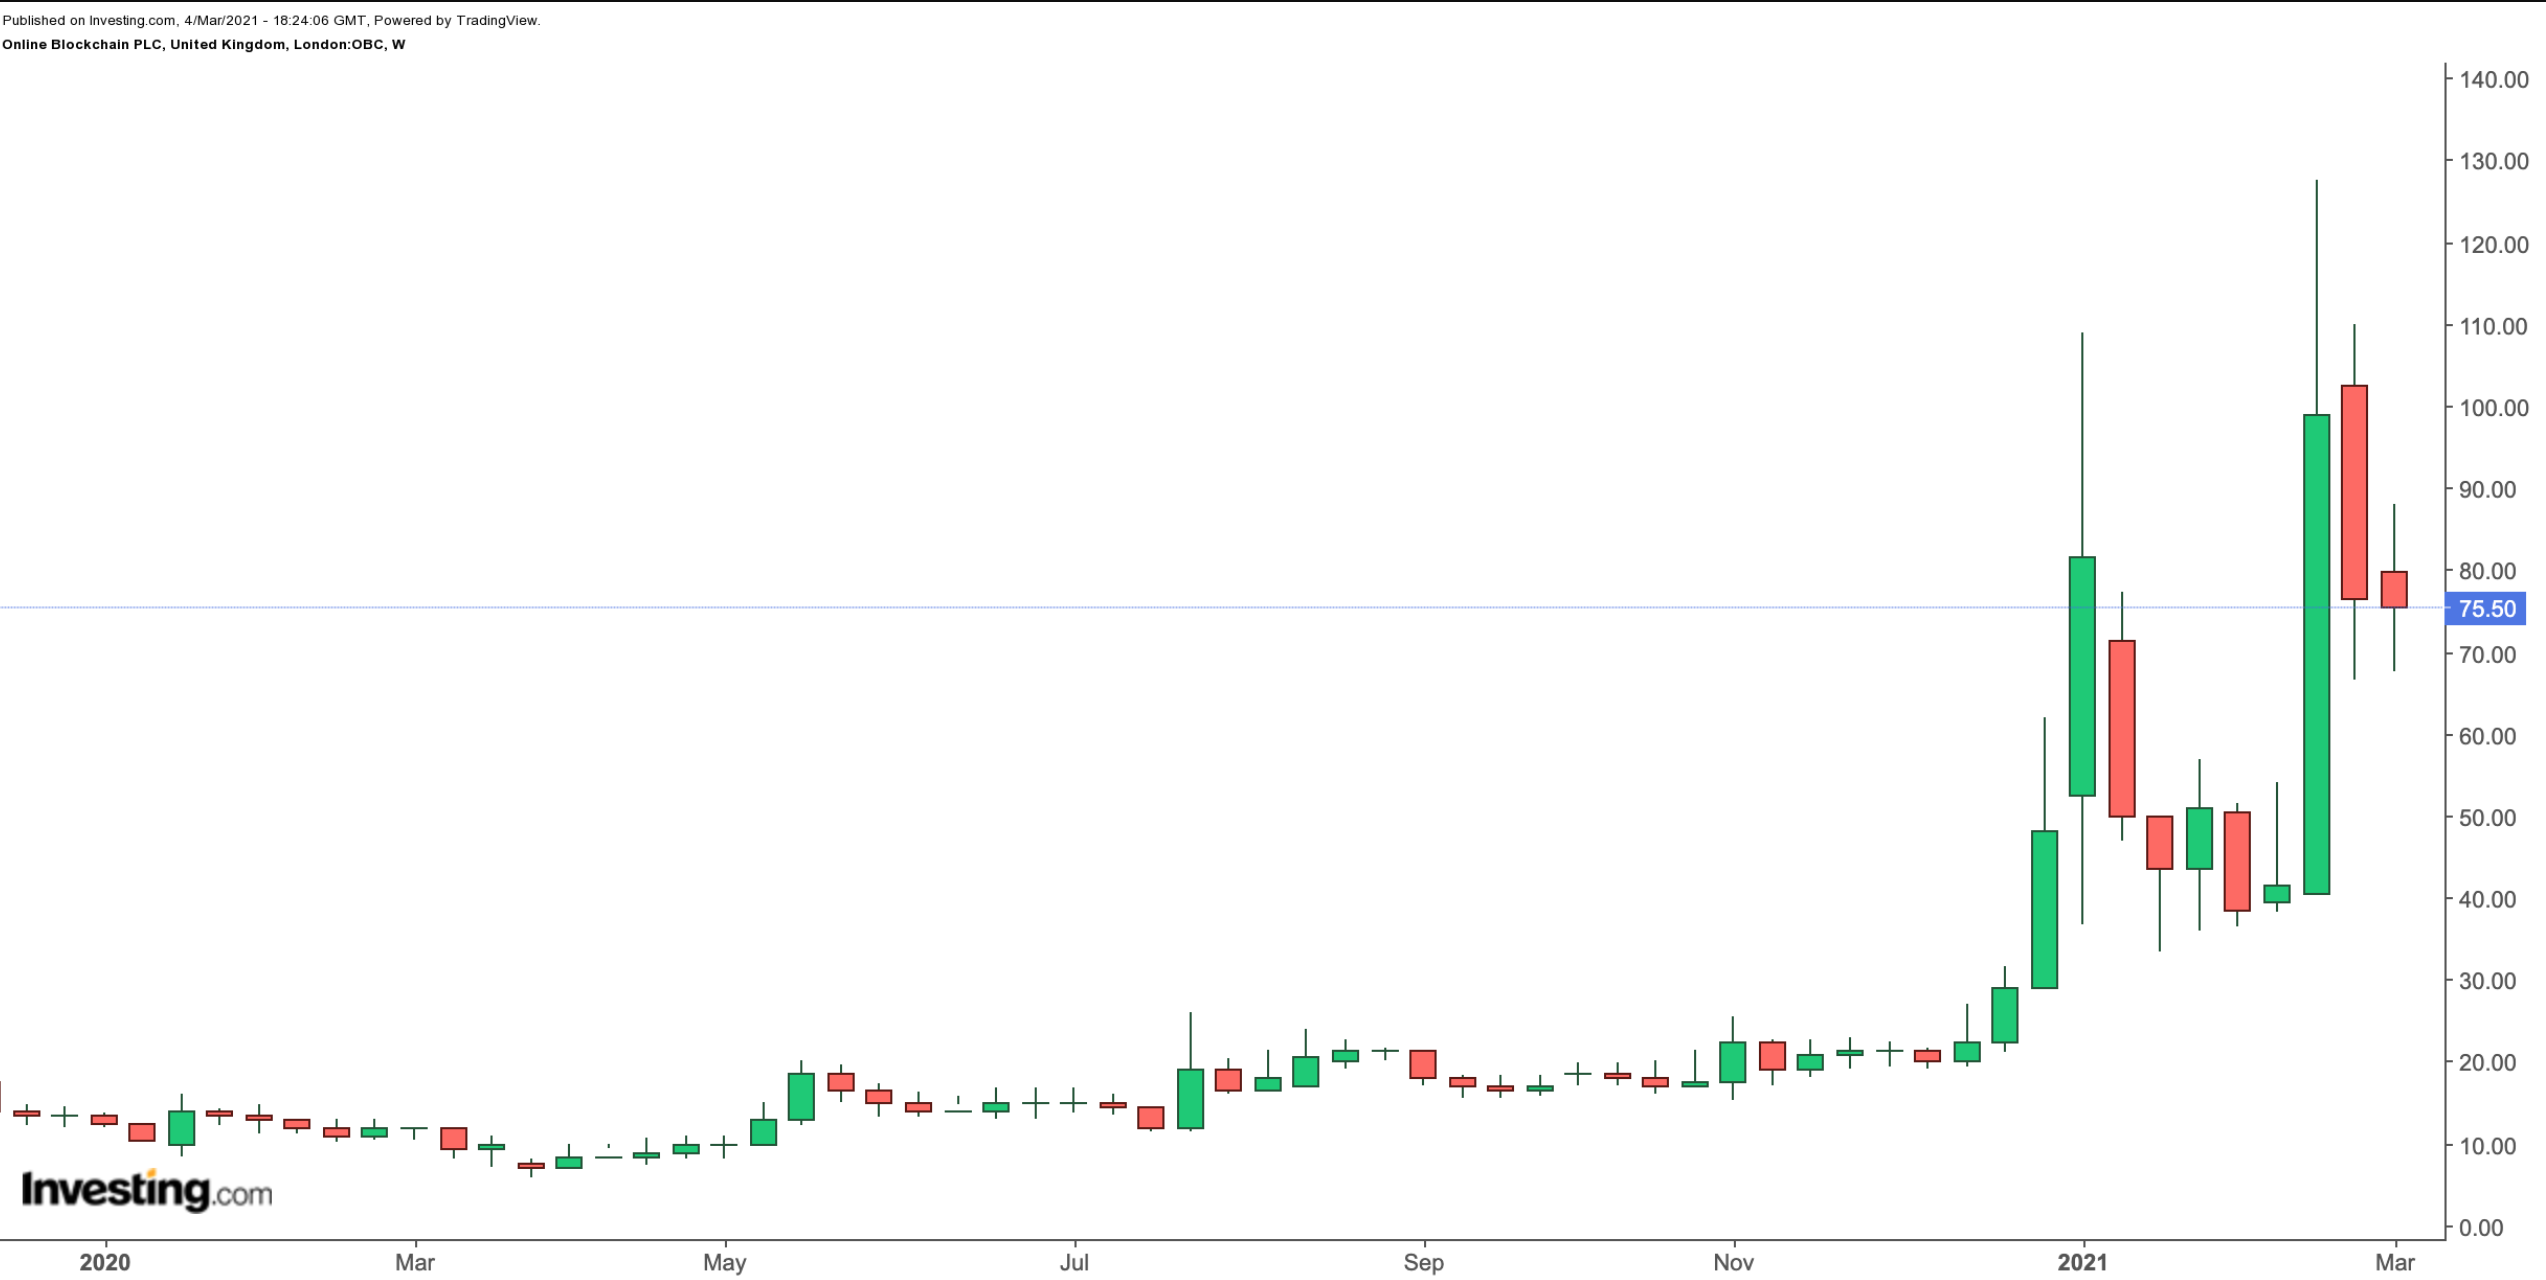 Online Blockchain Weekly Chart.